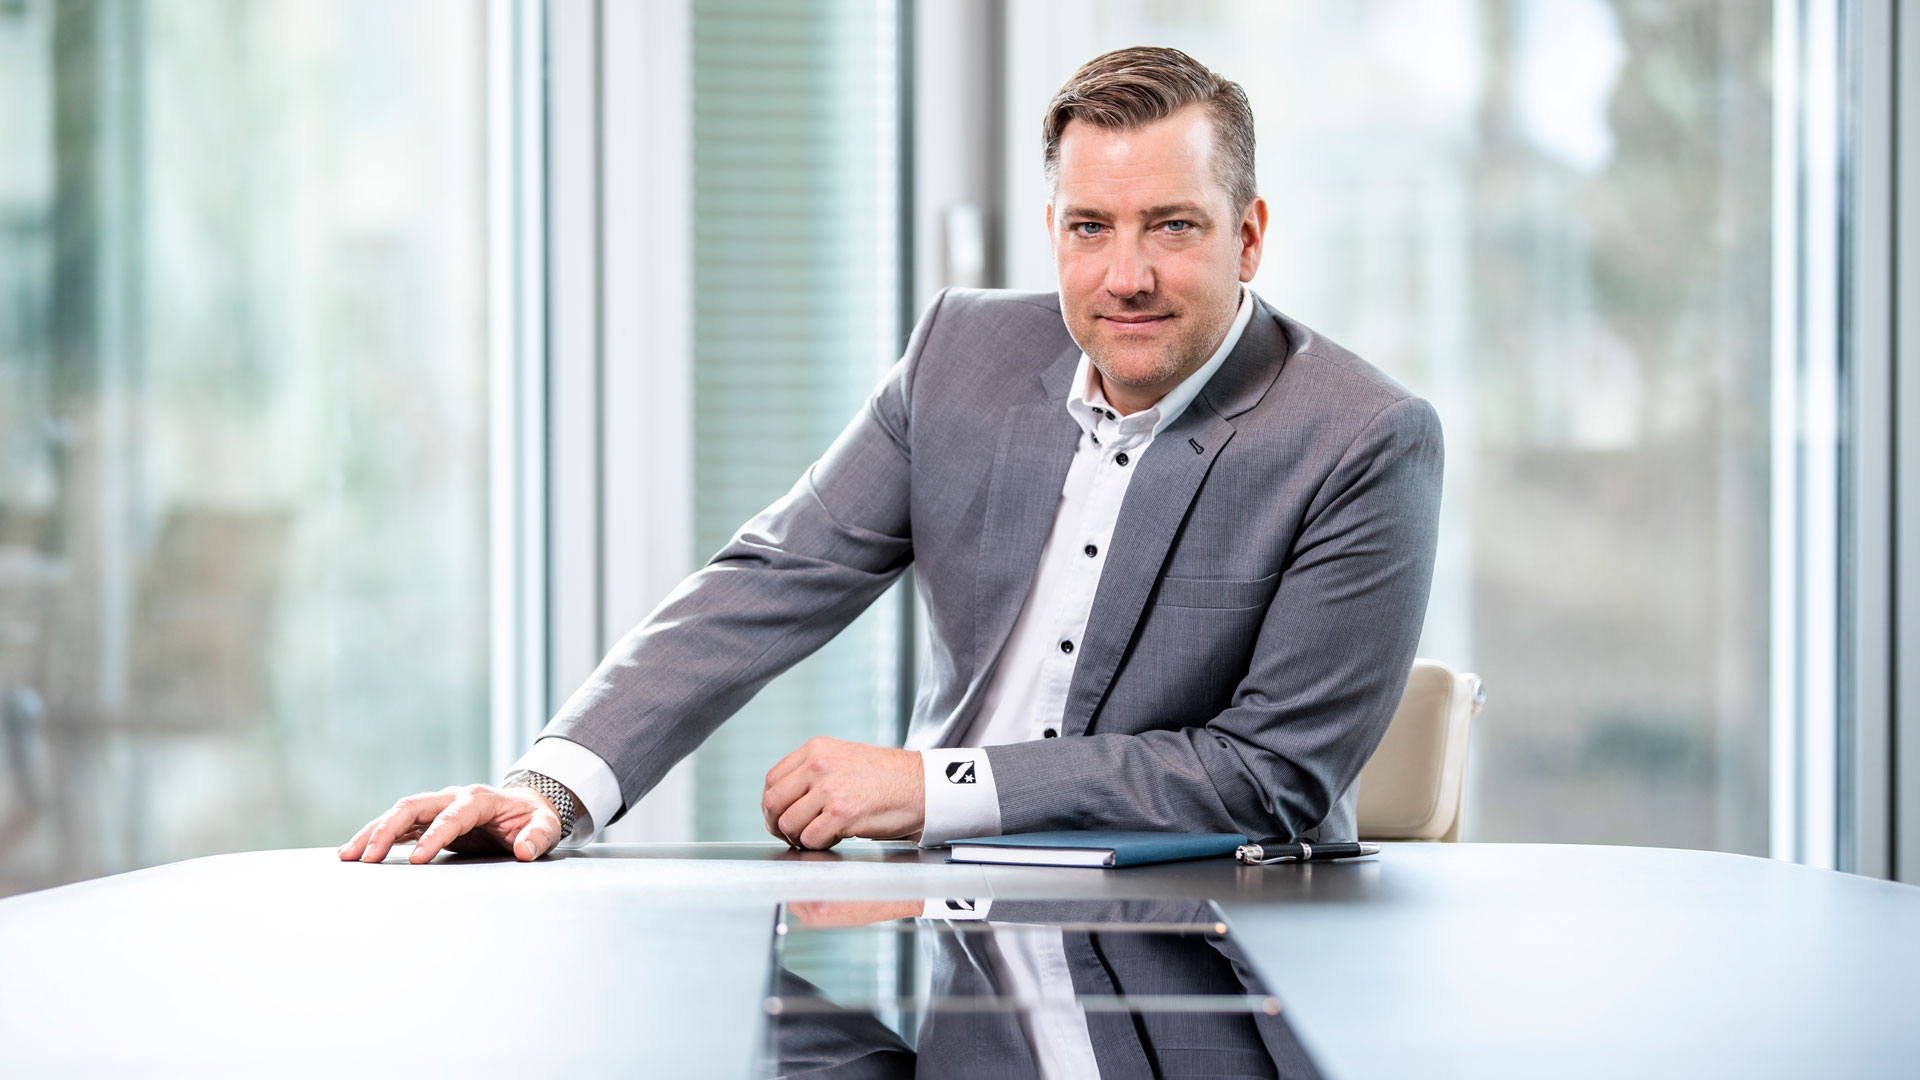 Cristian Hofmann: Führungserfolg trotz hoher Belastung